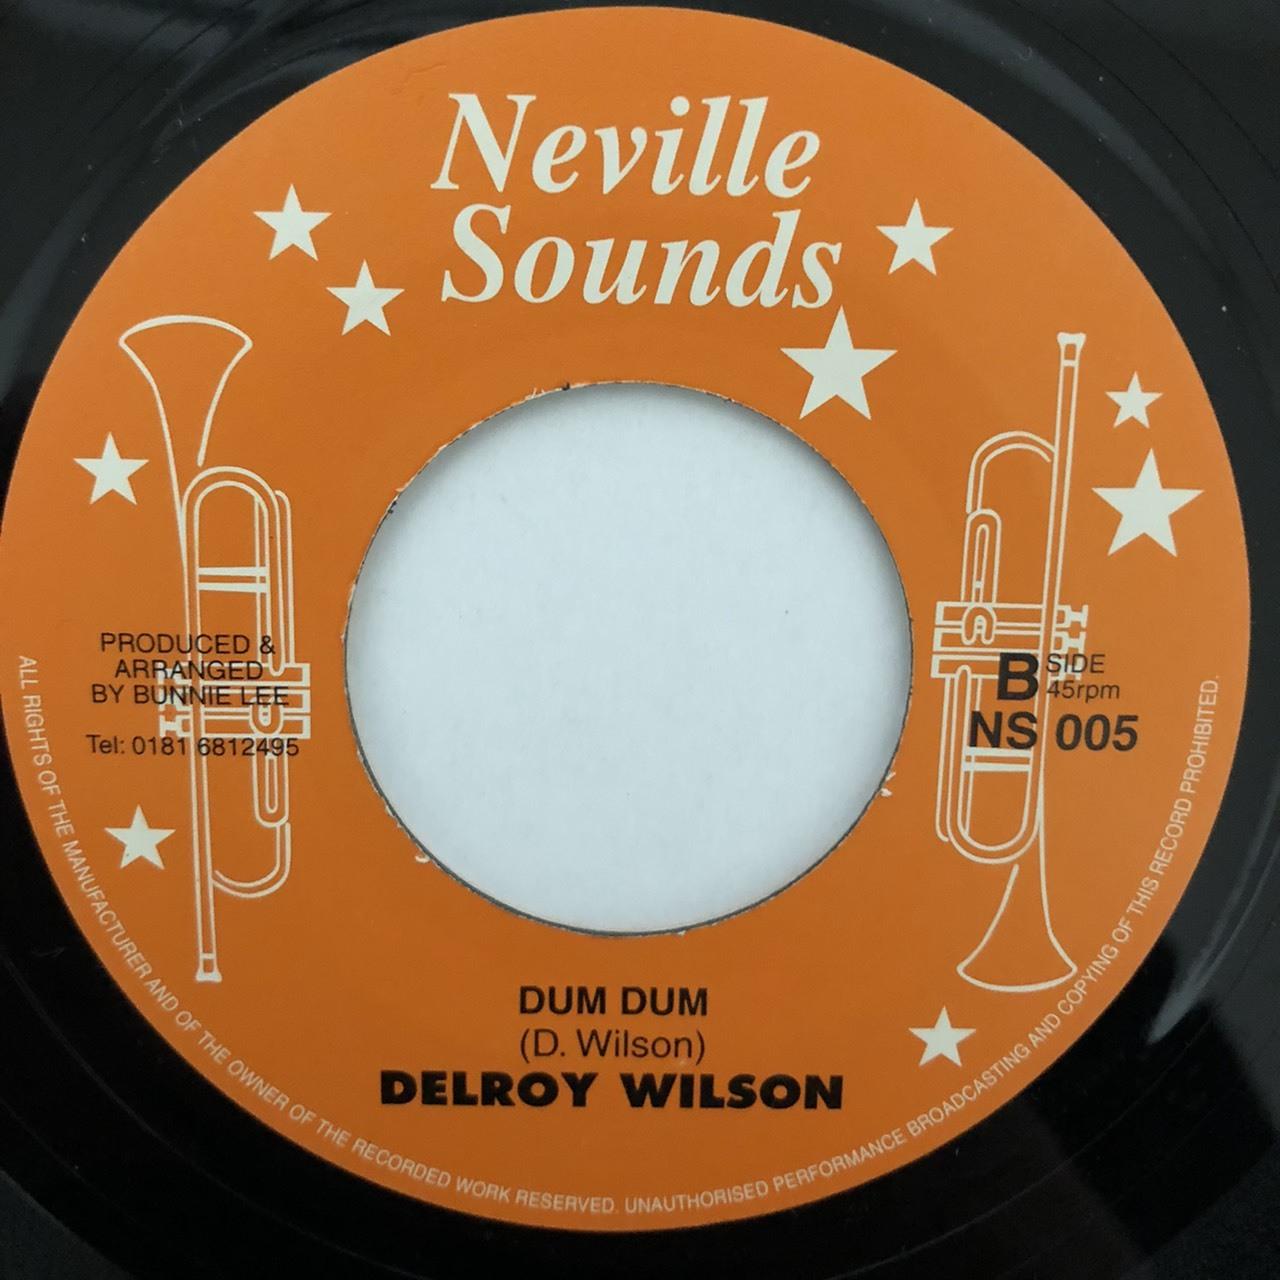 Delroy Wilson - Dum Dum【7-20477】